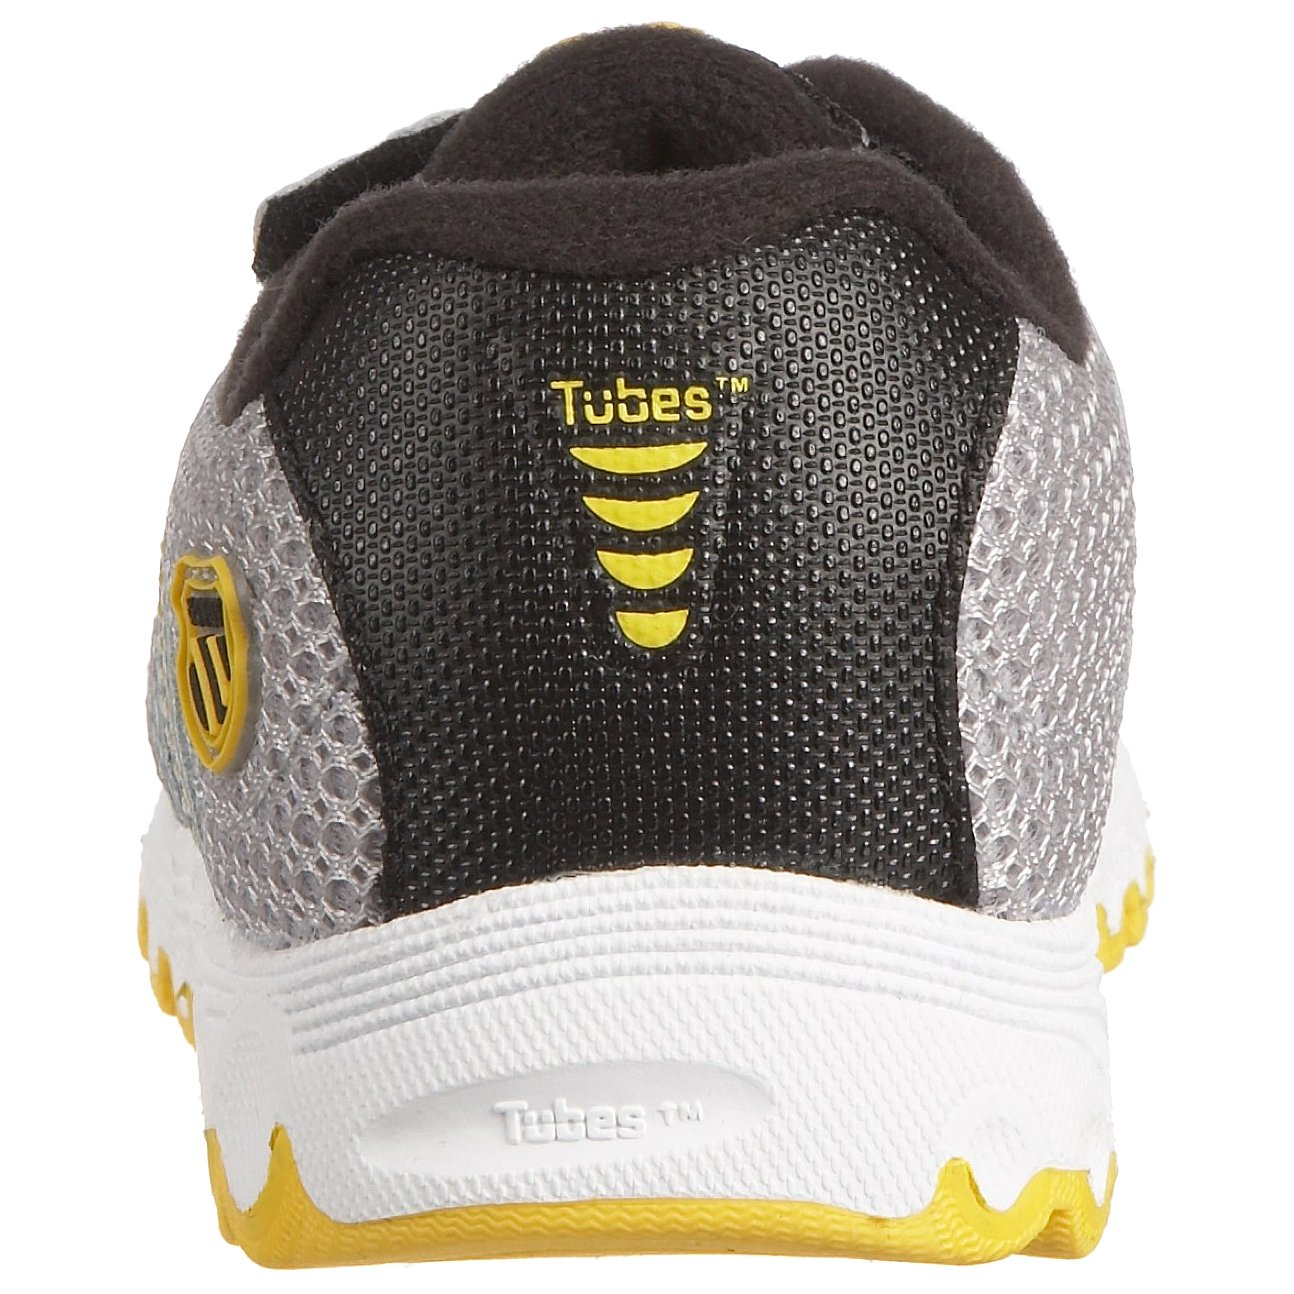 Infant//Toddler K-Swiss 22443 Tubes Run 100 VLC Mesh Running Shoe